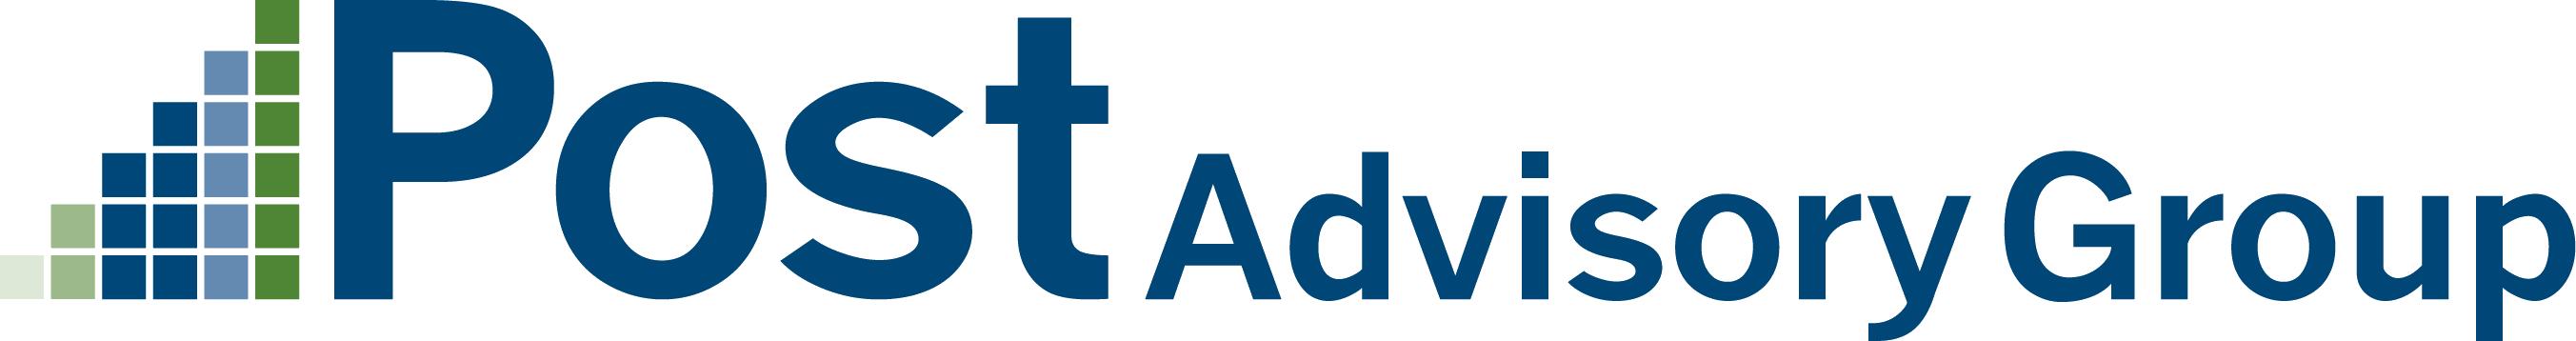 Post Advisory Group